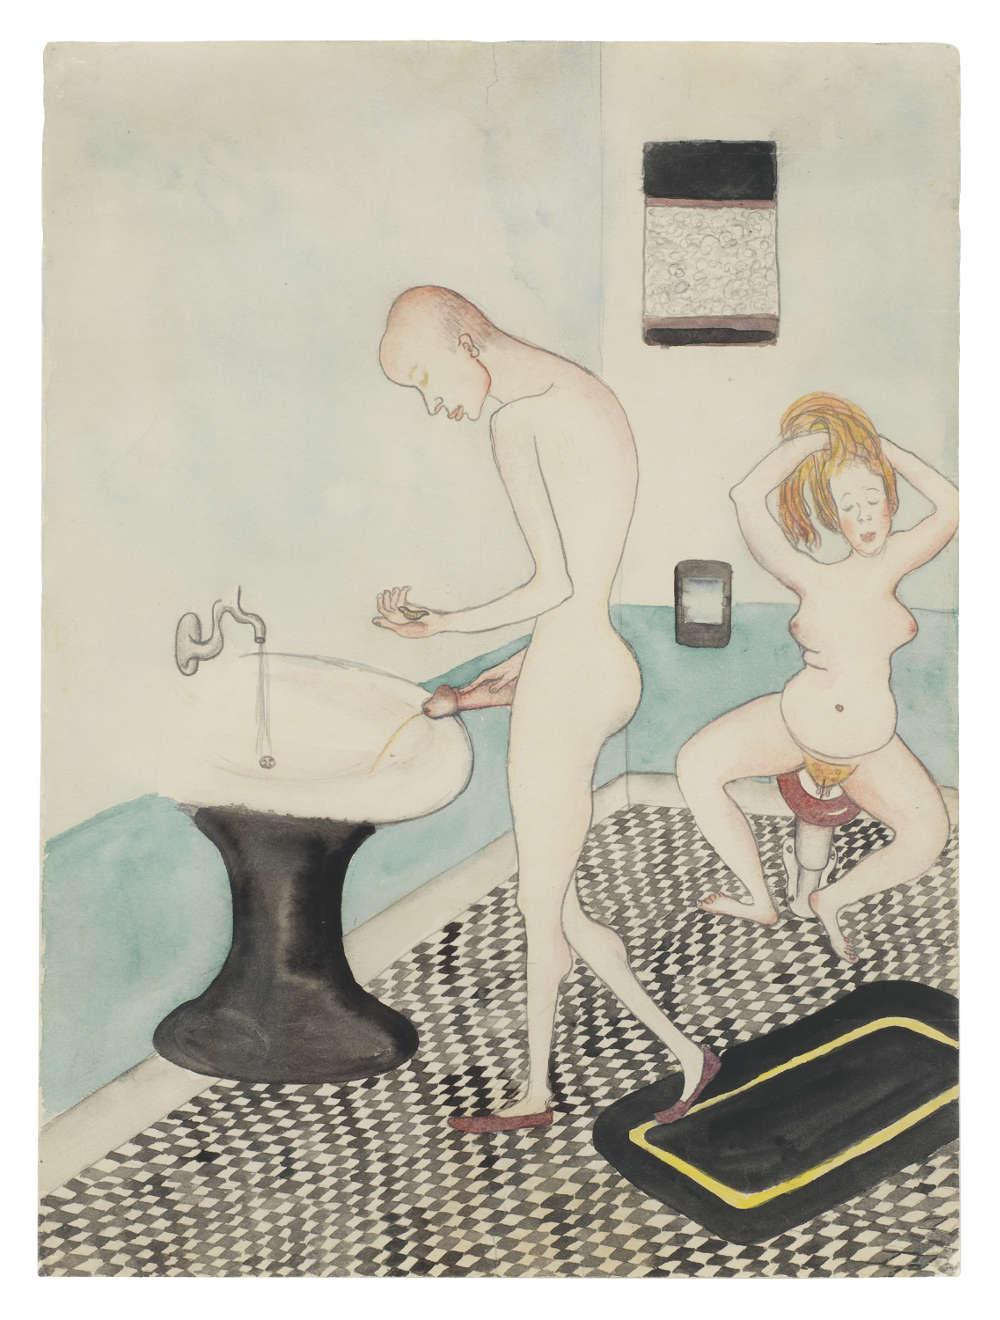 Alice Neel, Untitled (Alice Neel and John Rothschild in the Bathroom), 1935. Courtesy The Estate of Alice Neel and David Zwirner © The Estate of Alice Neel